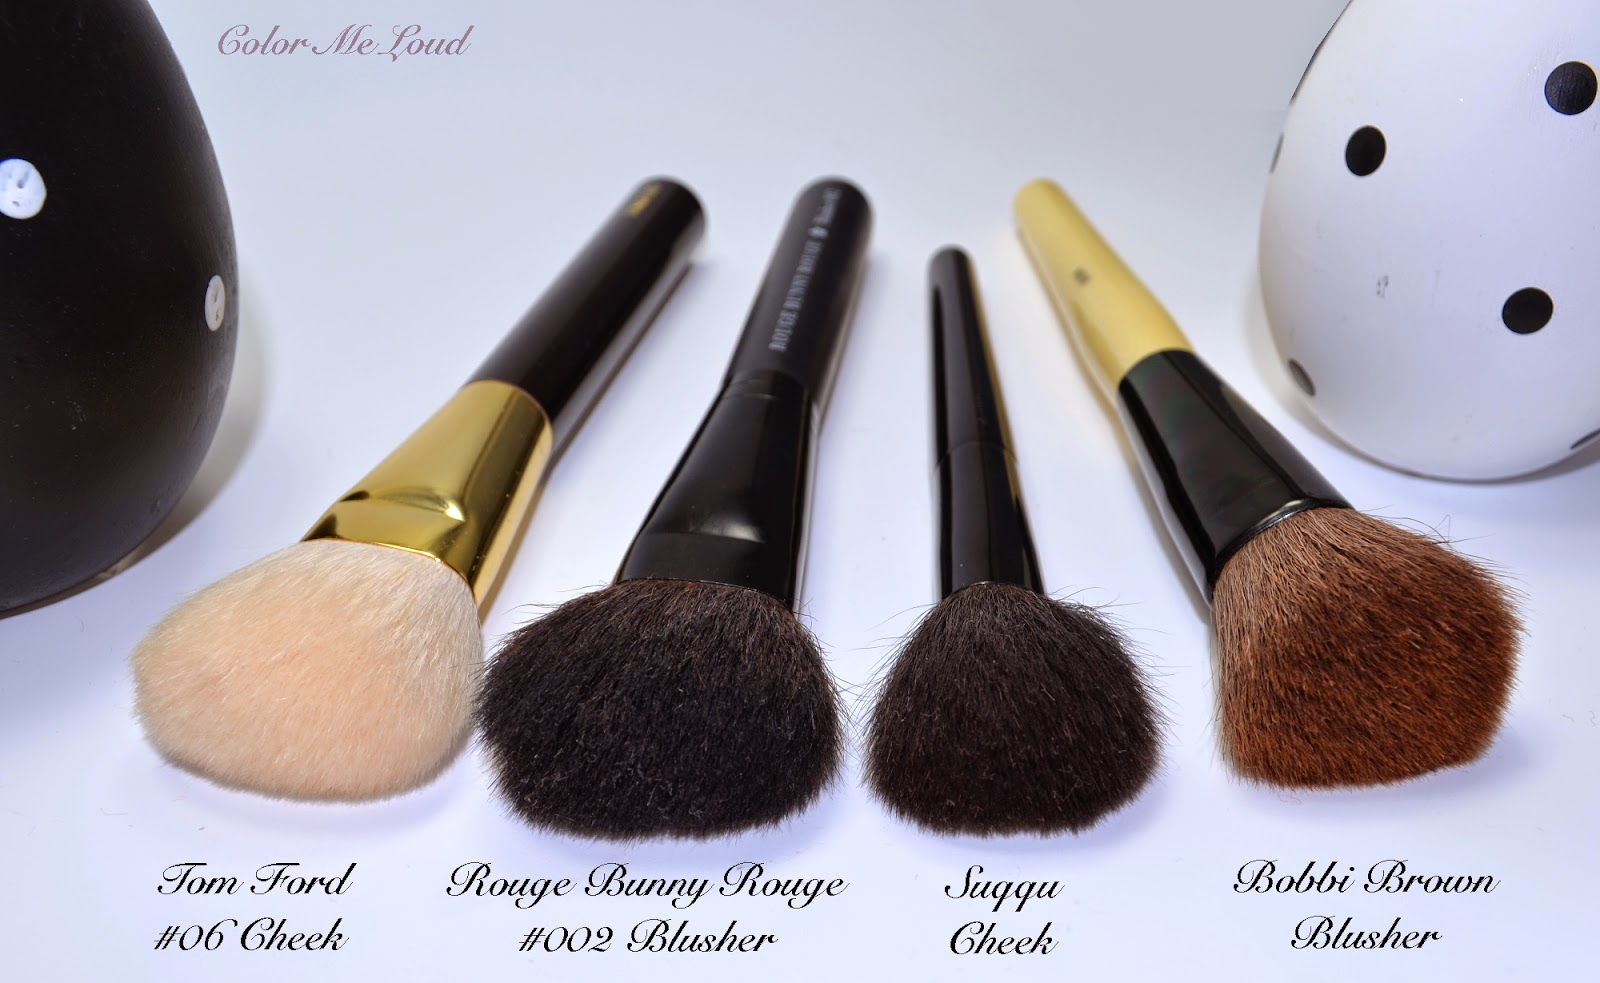 bobbi brown brushes price. rouge bunny blusher brush #002 vs. tom ford #06 cheek, suqqu cheek and bobbi brown brushes price